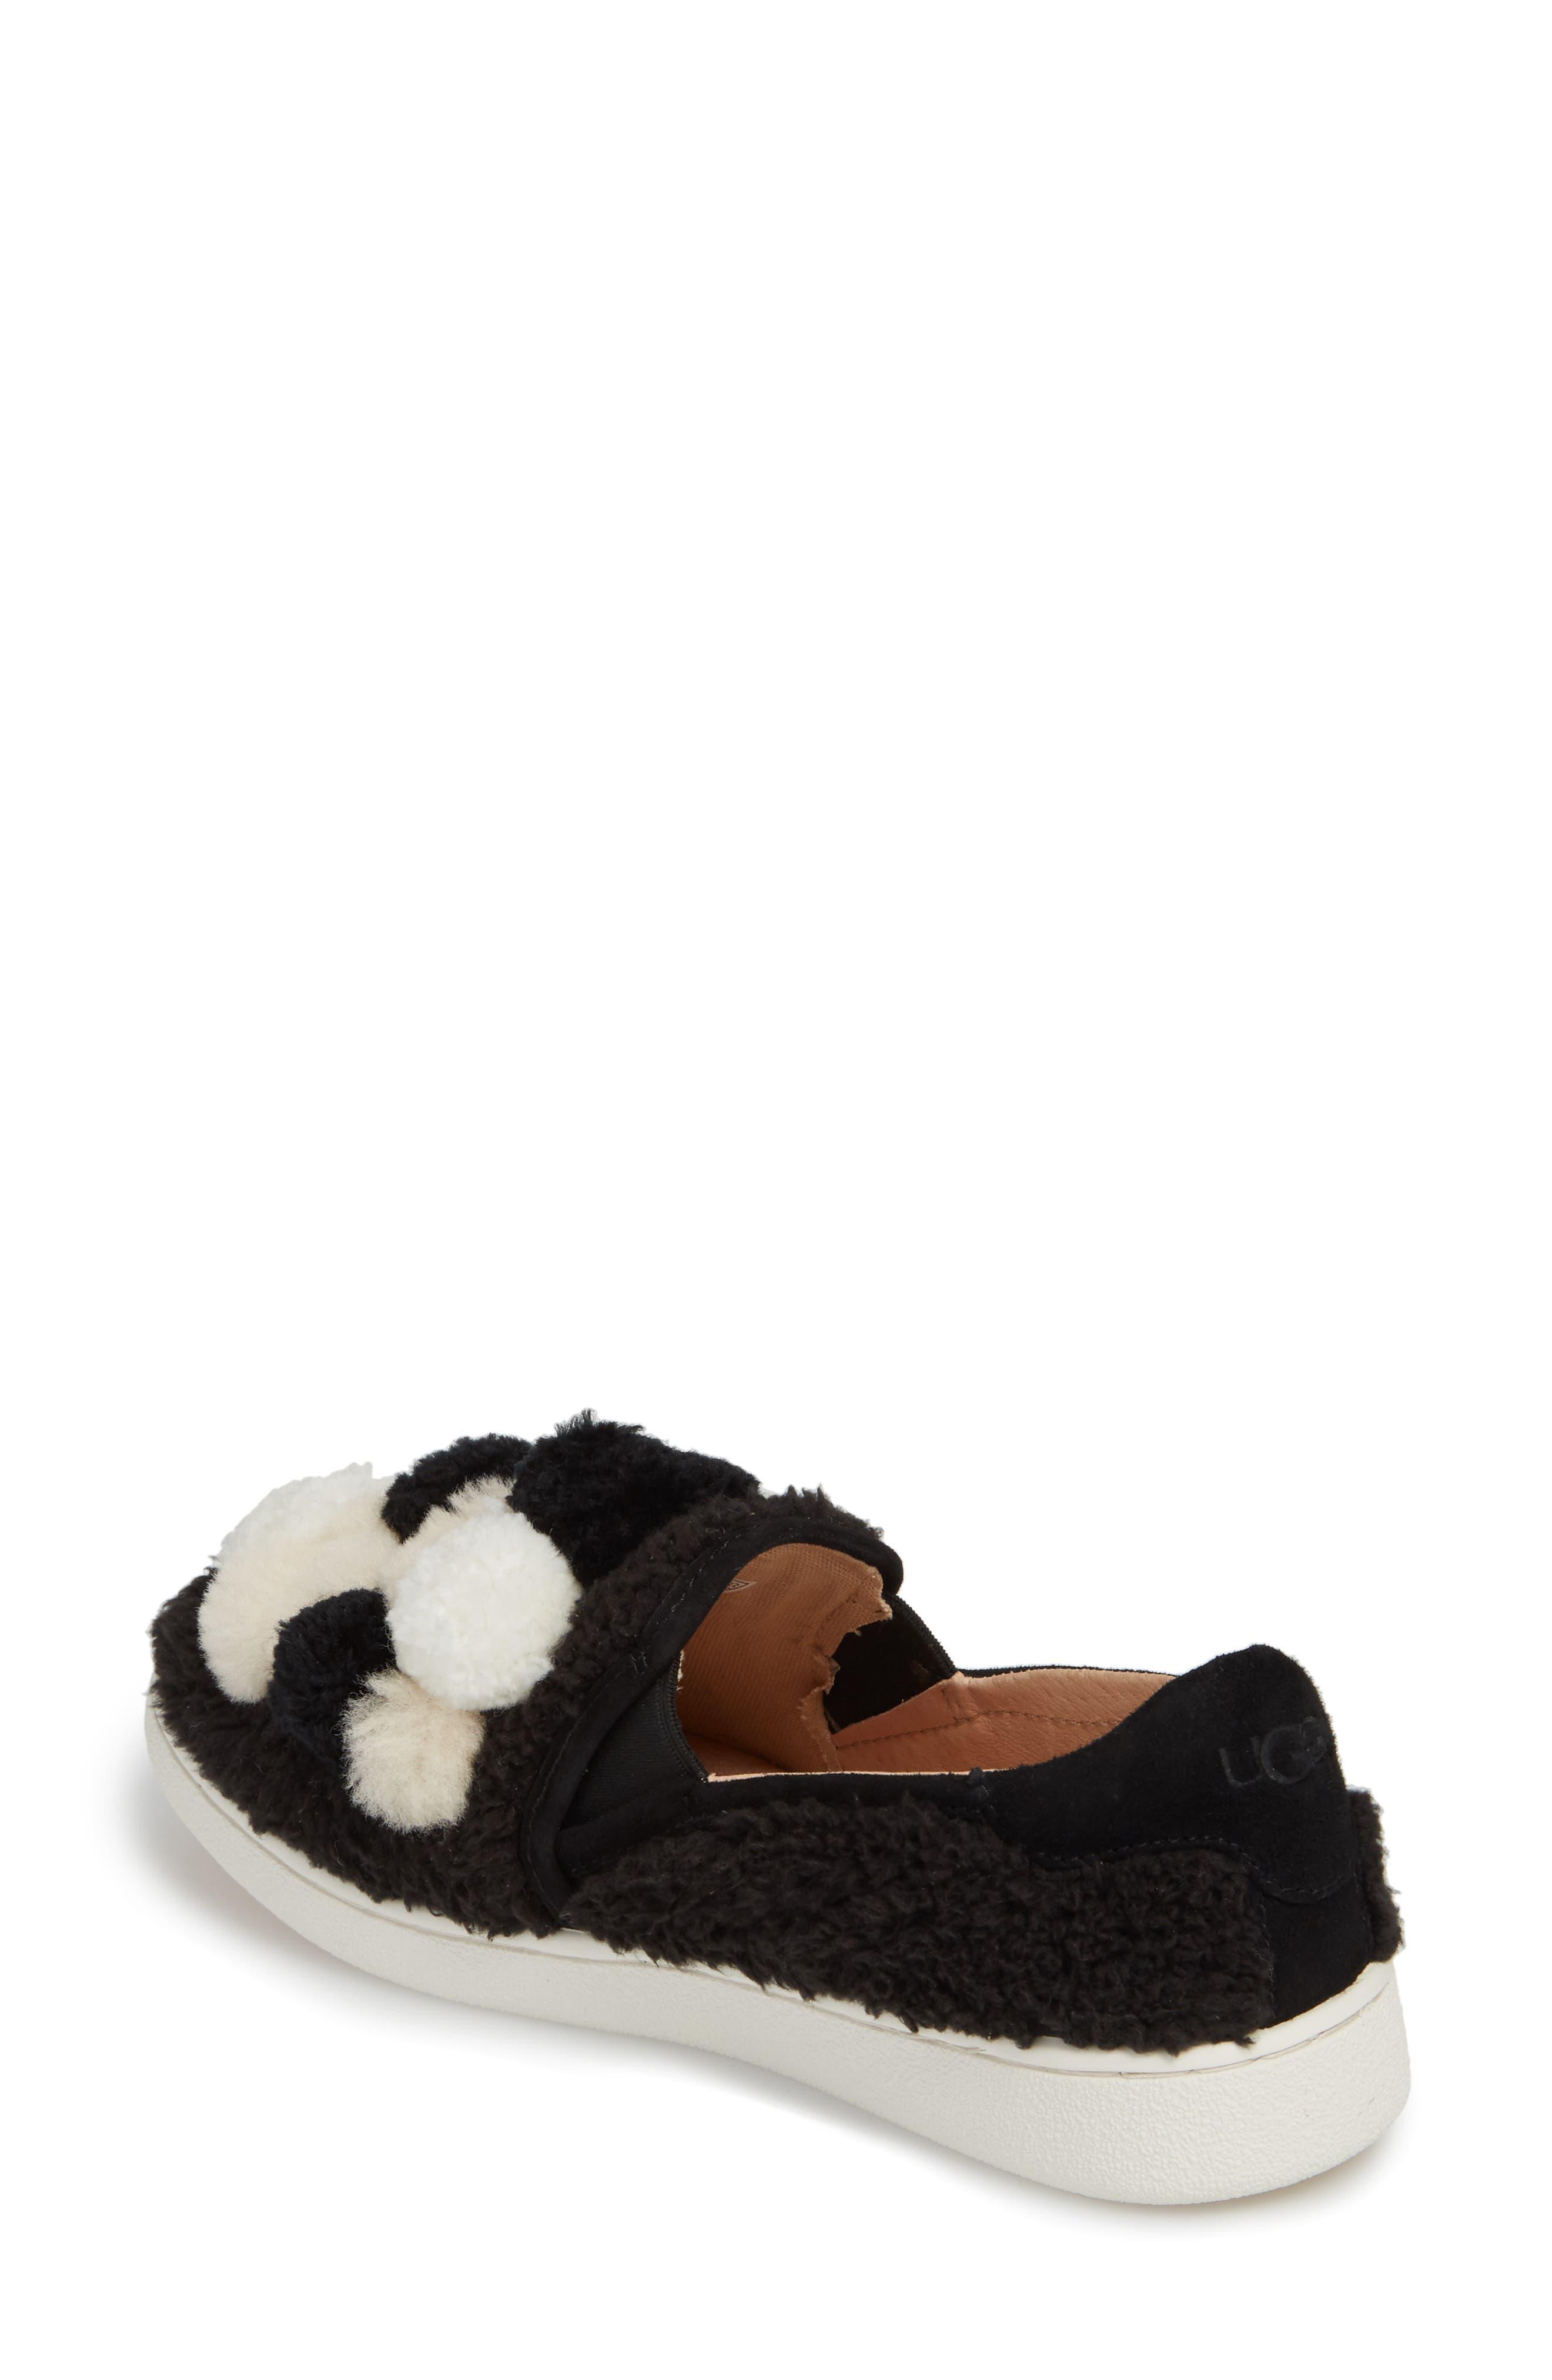 Ricci Plush Genuine Shearling Pompom Slip-On Sneaker,                             Alternate thumbnail 2, color,                             001